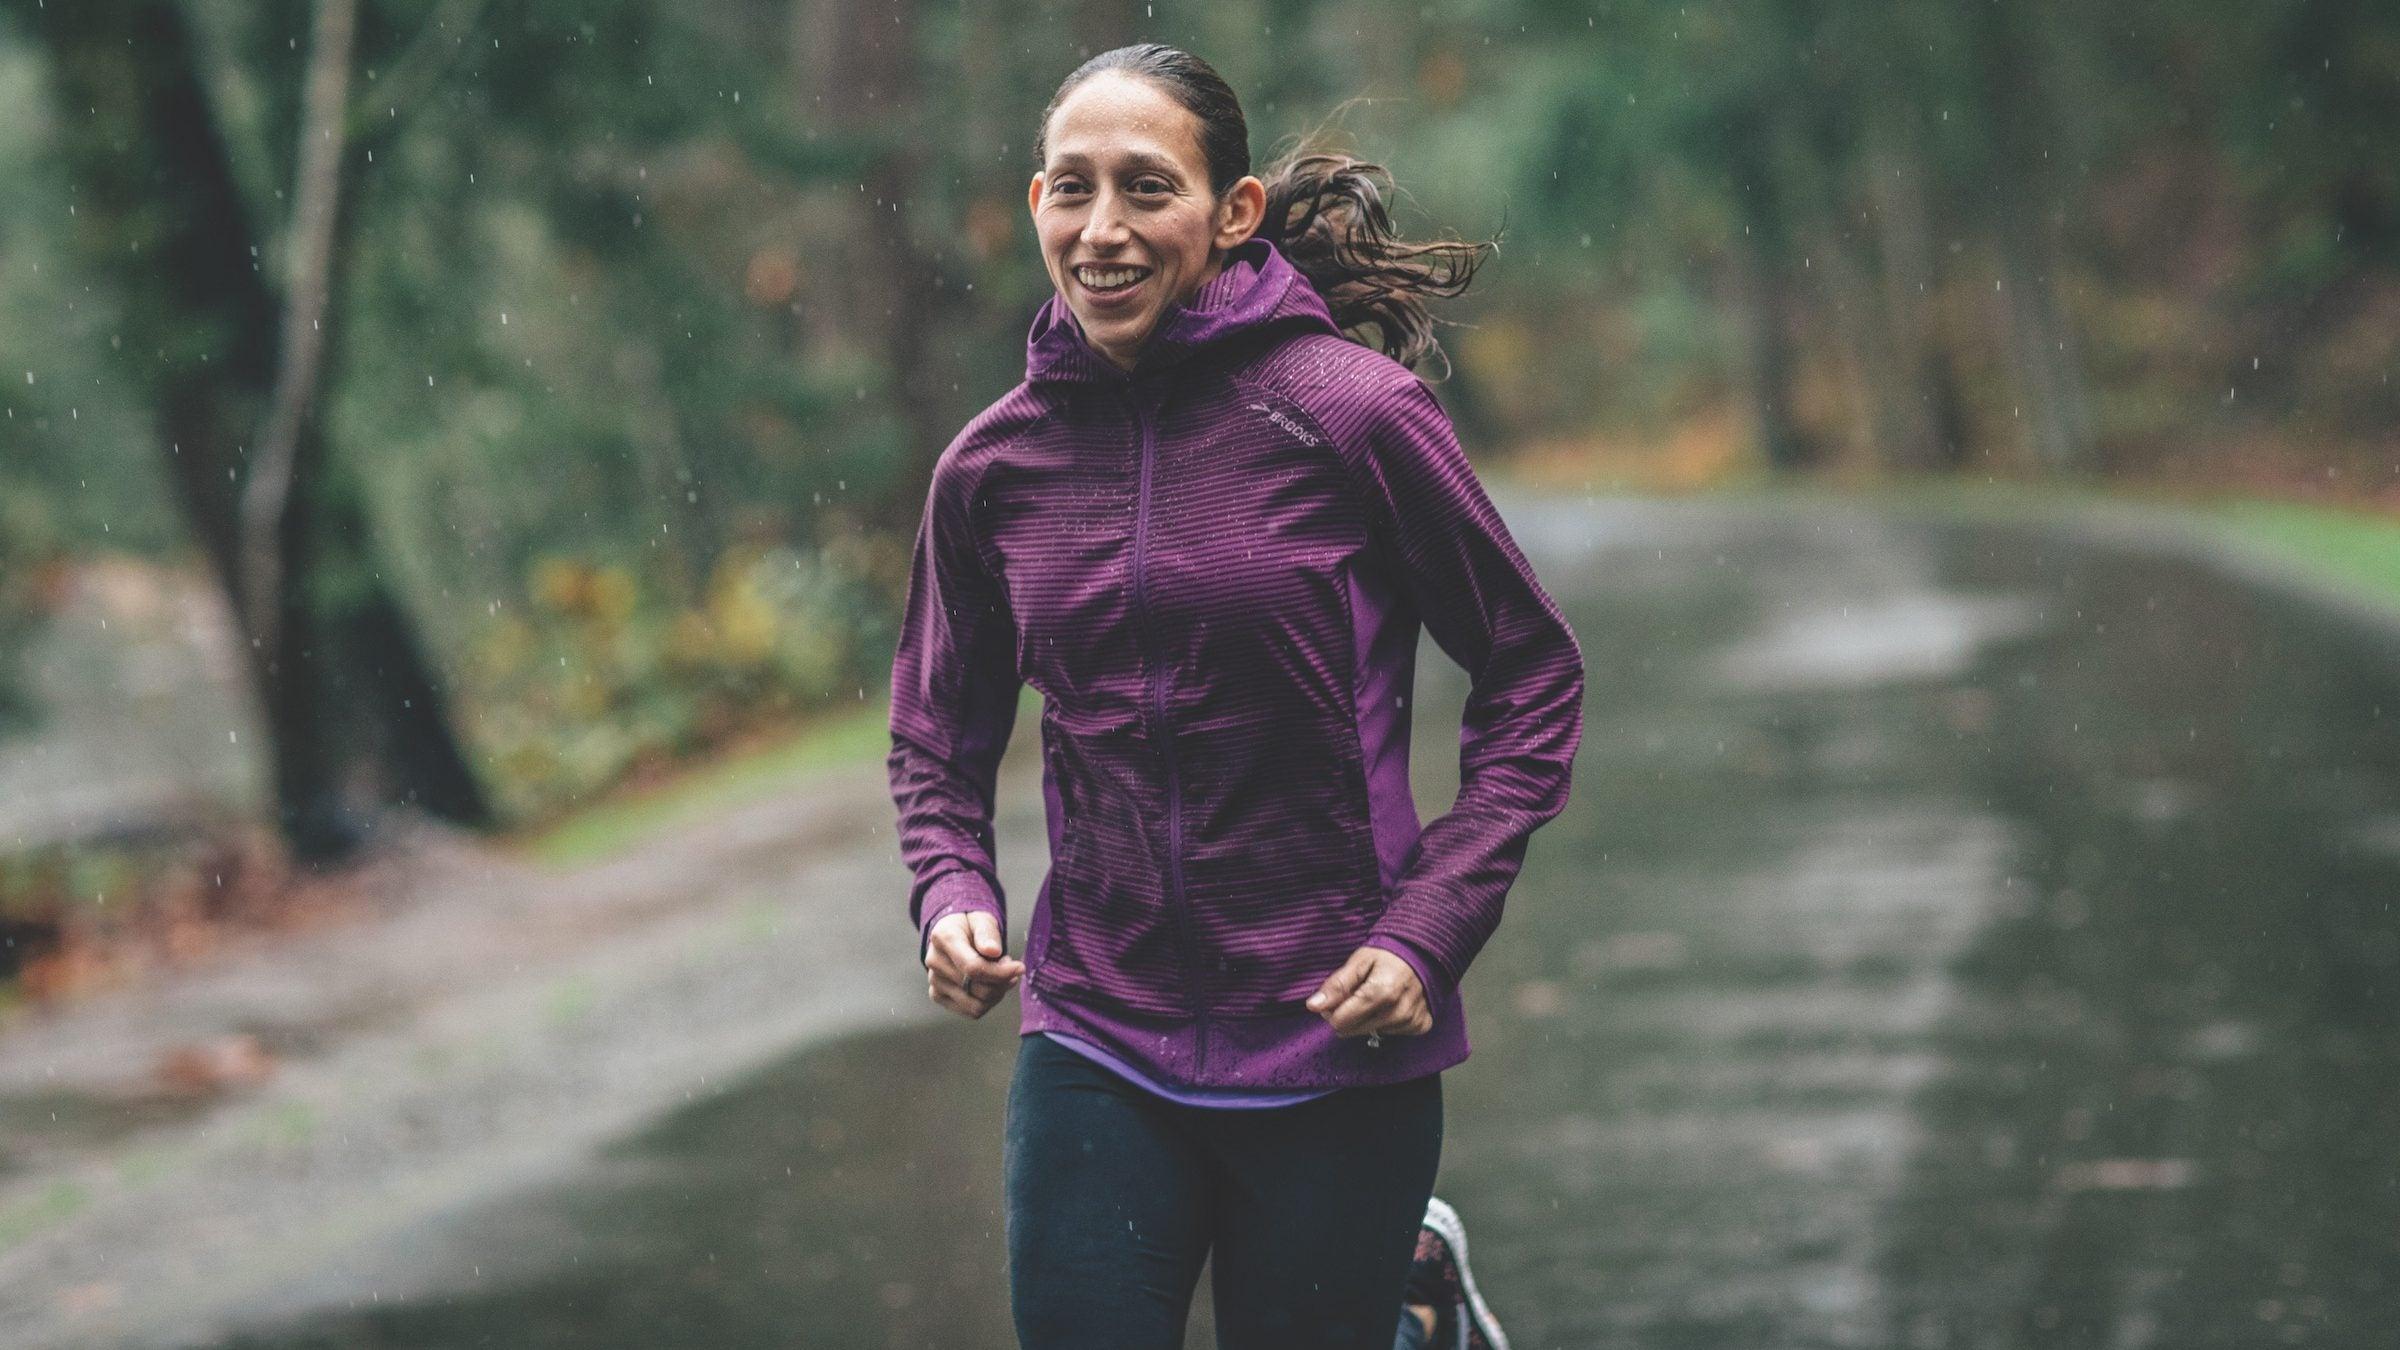 Desiree Linden running on a rainy road